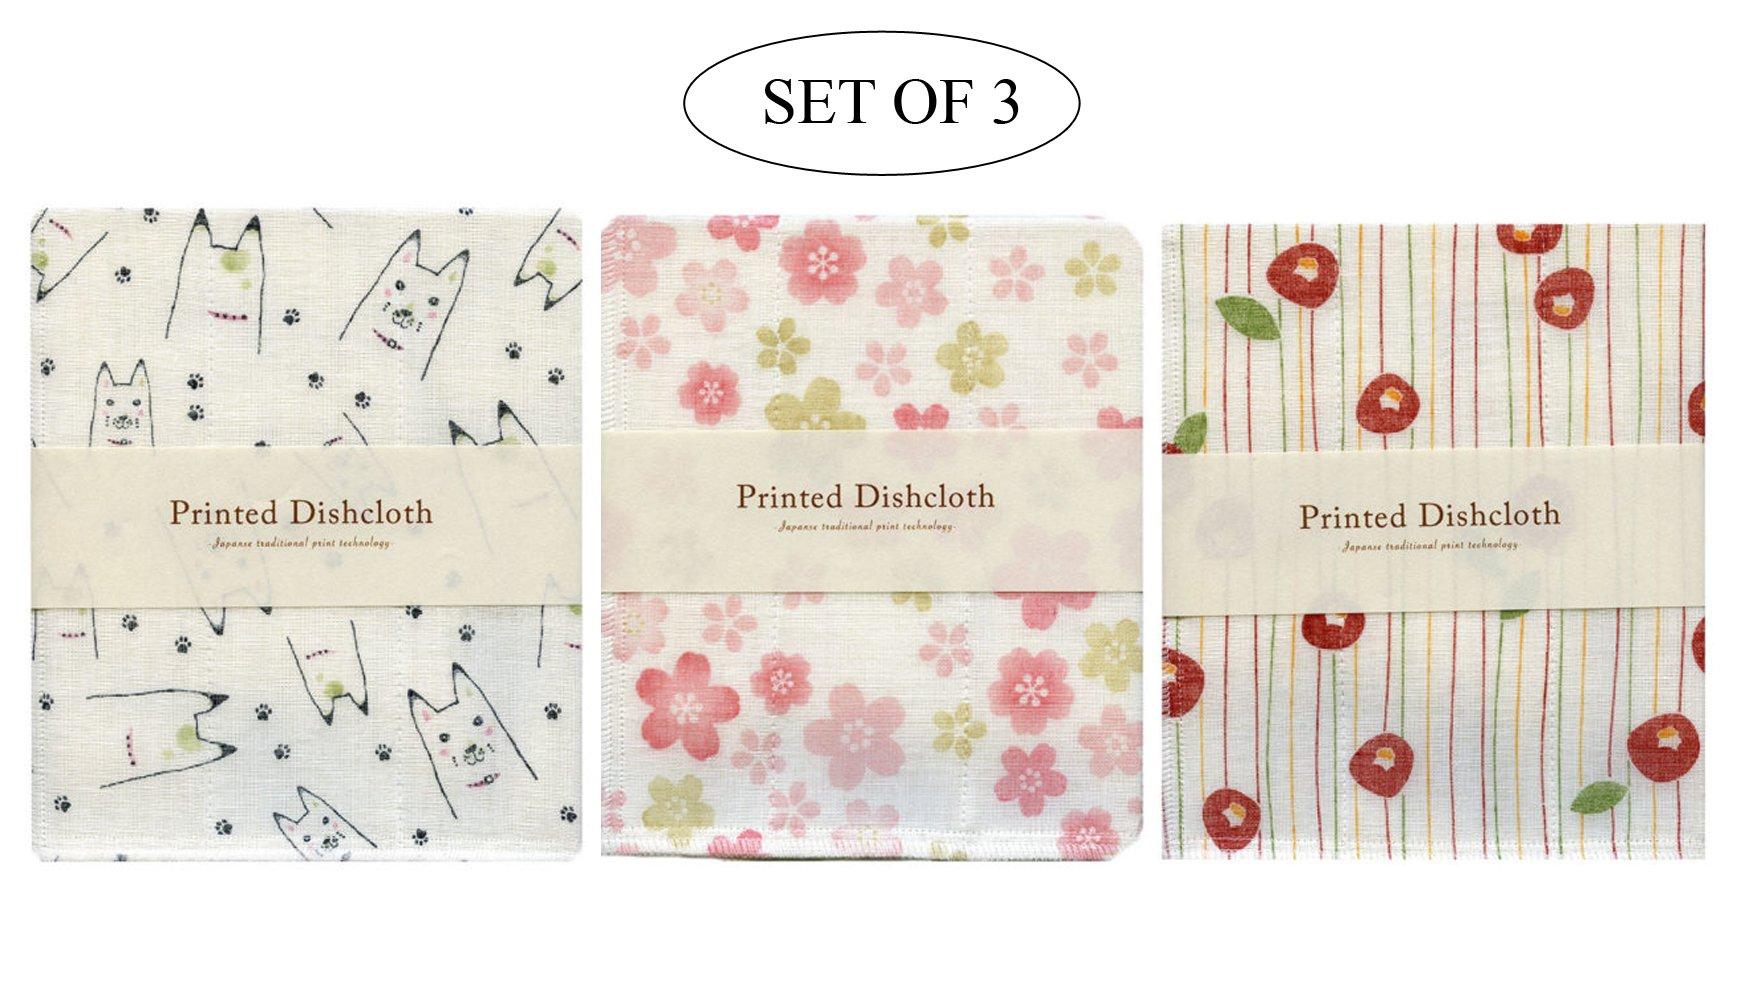 IPPINKA Nawrap Set of 3 Printed Dishcloths, Animal Print, Flower Print and Poppy Print